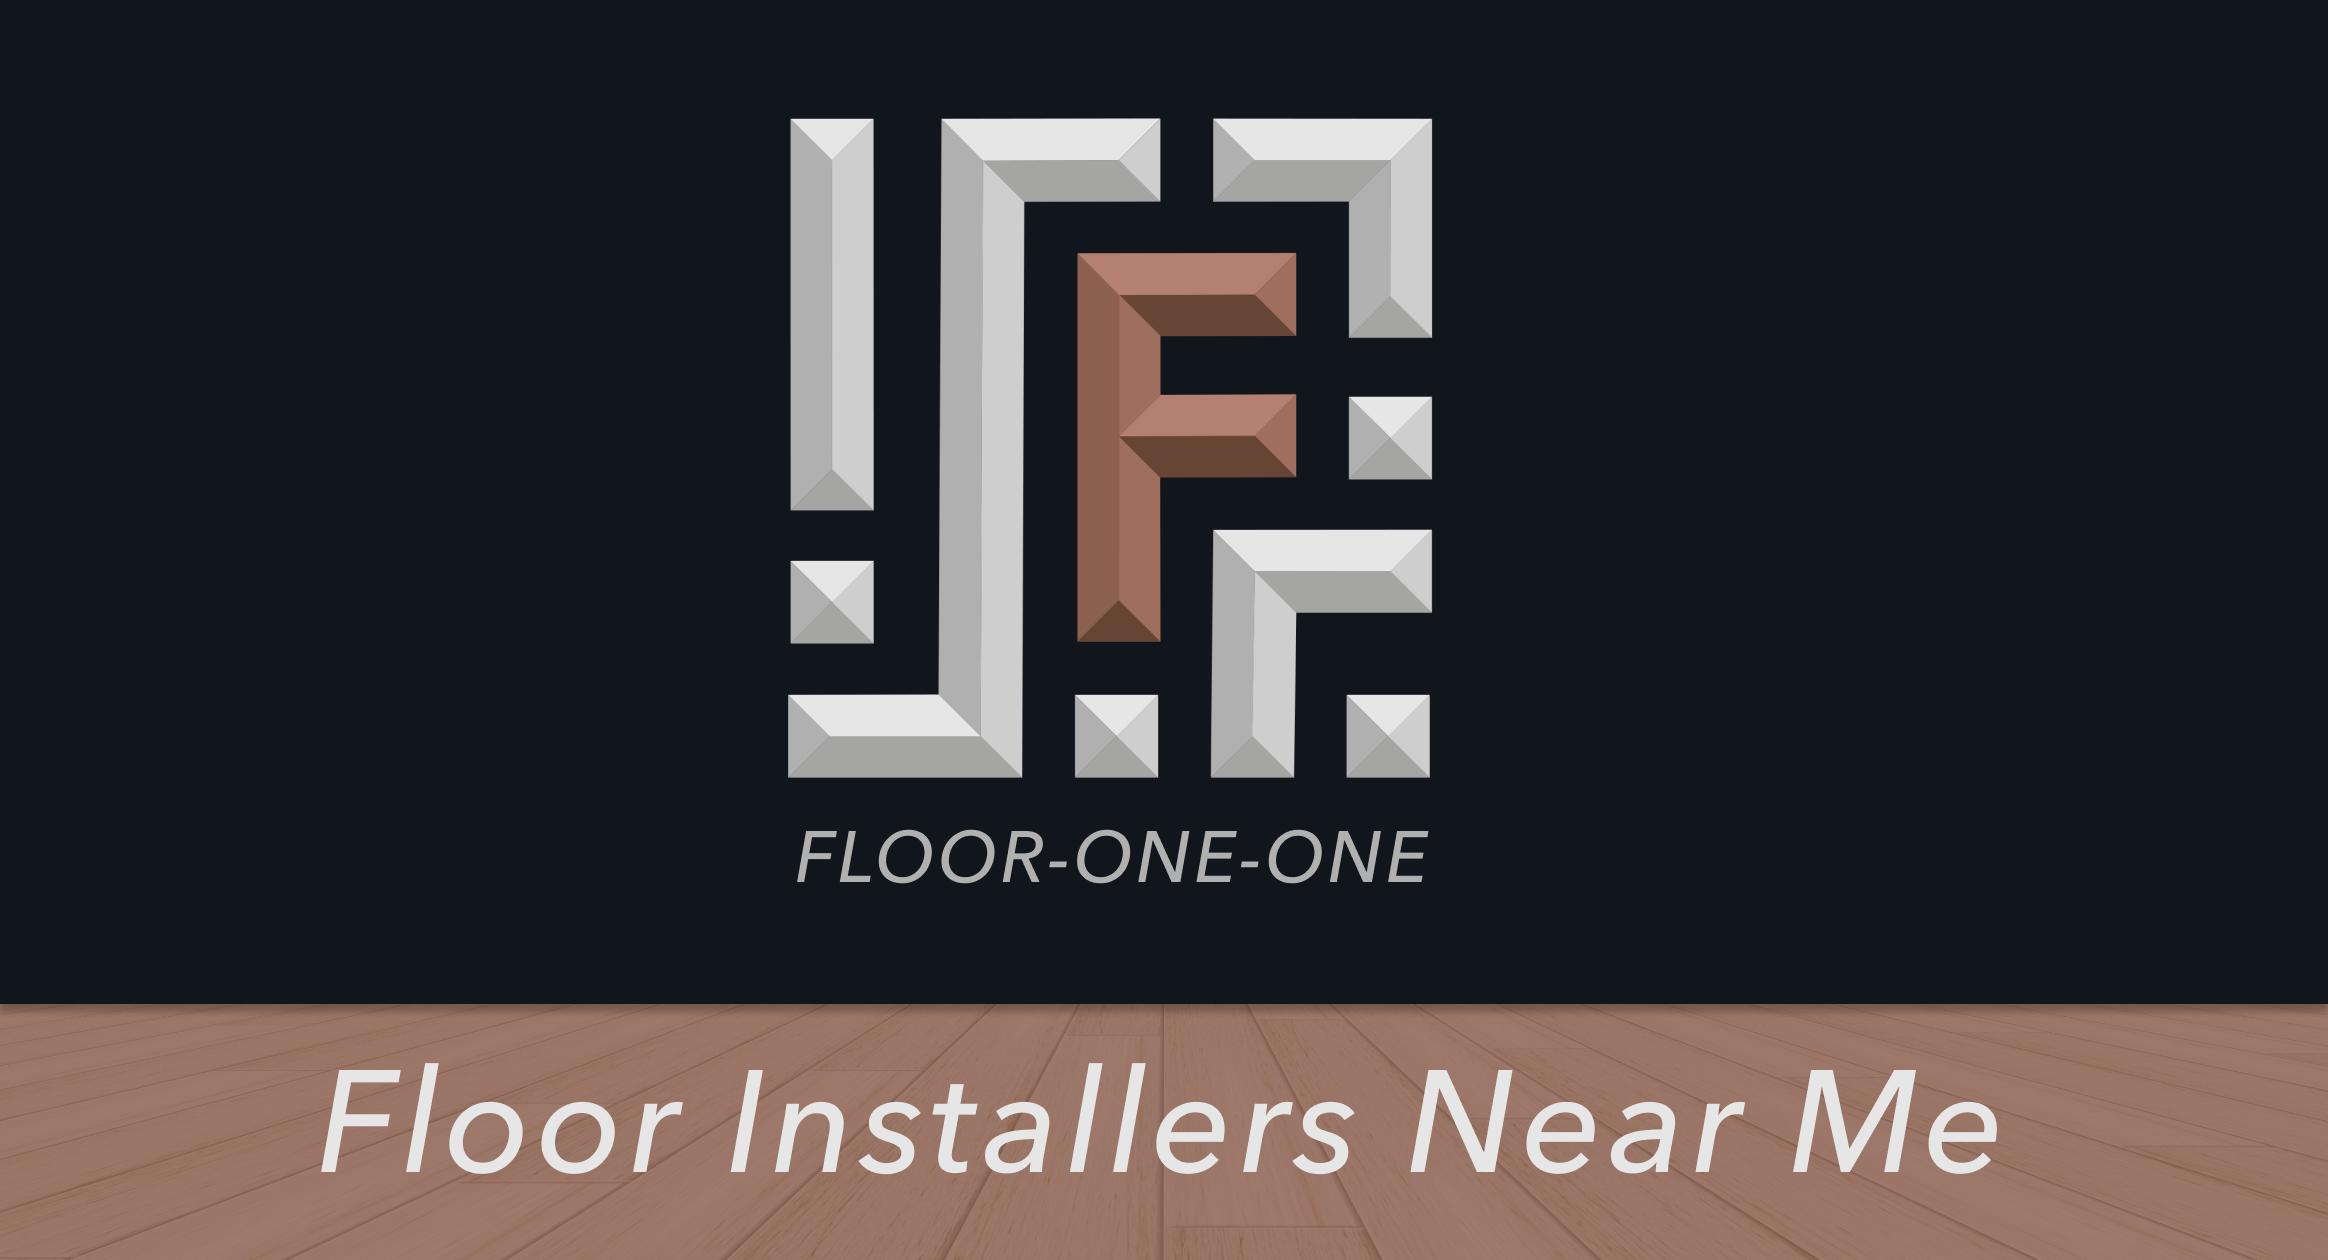 Floor Installers Near Me